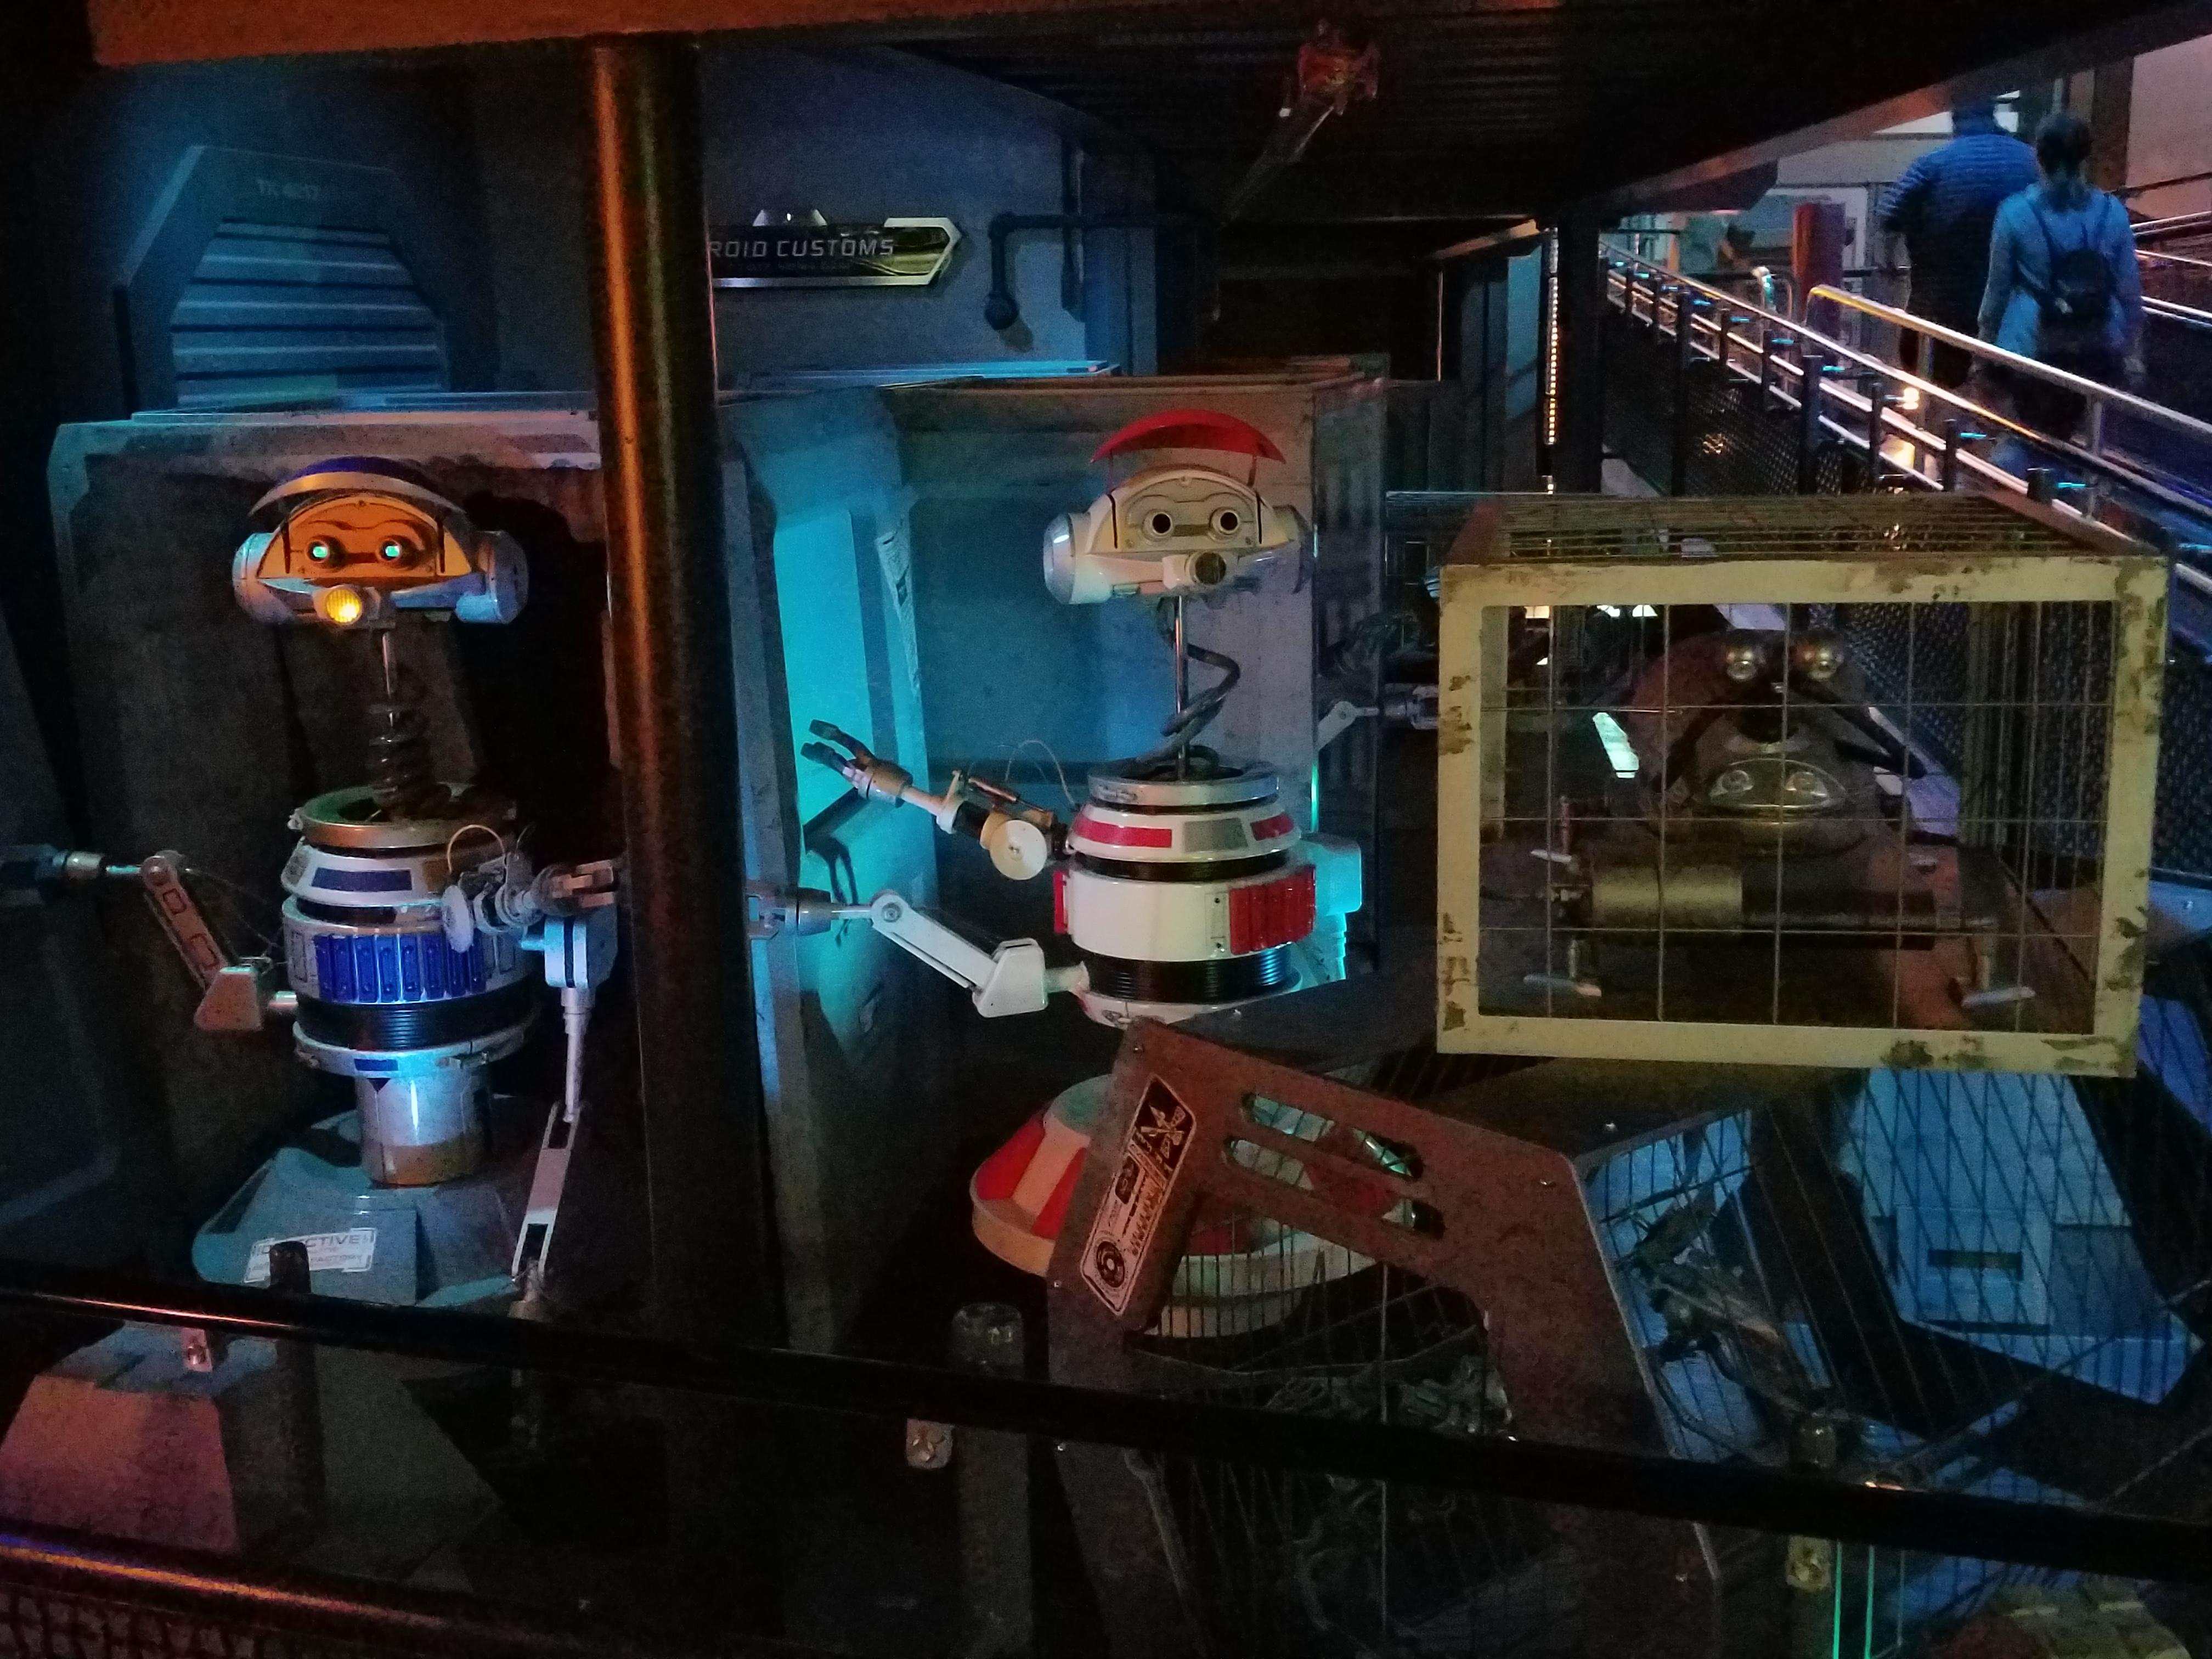 R2-D2 is Your Companion